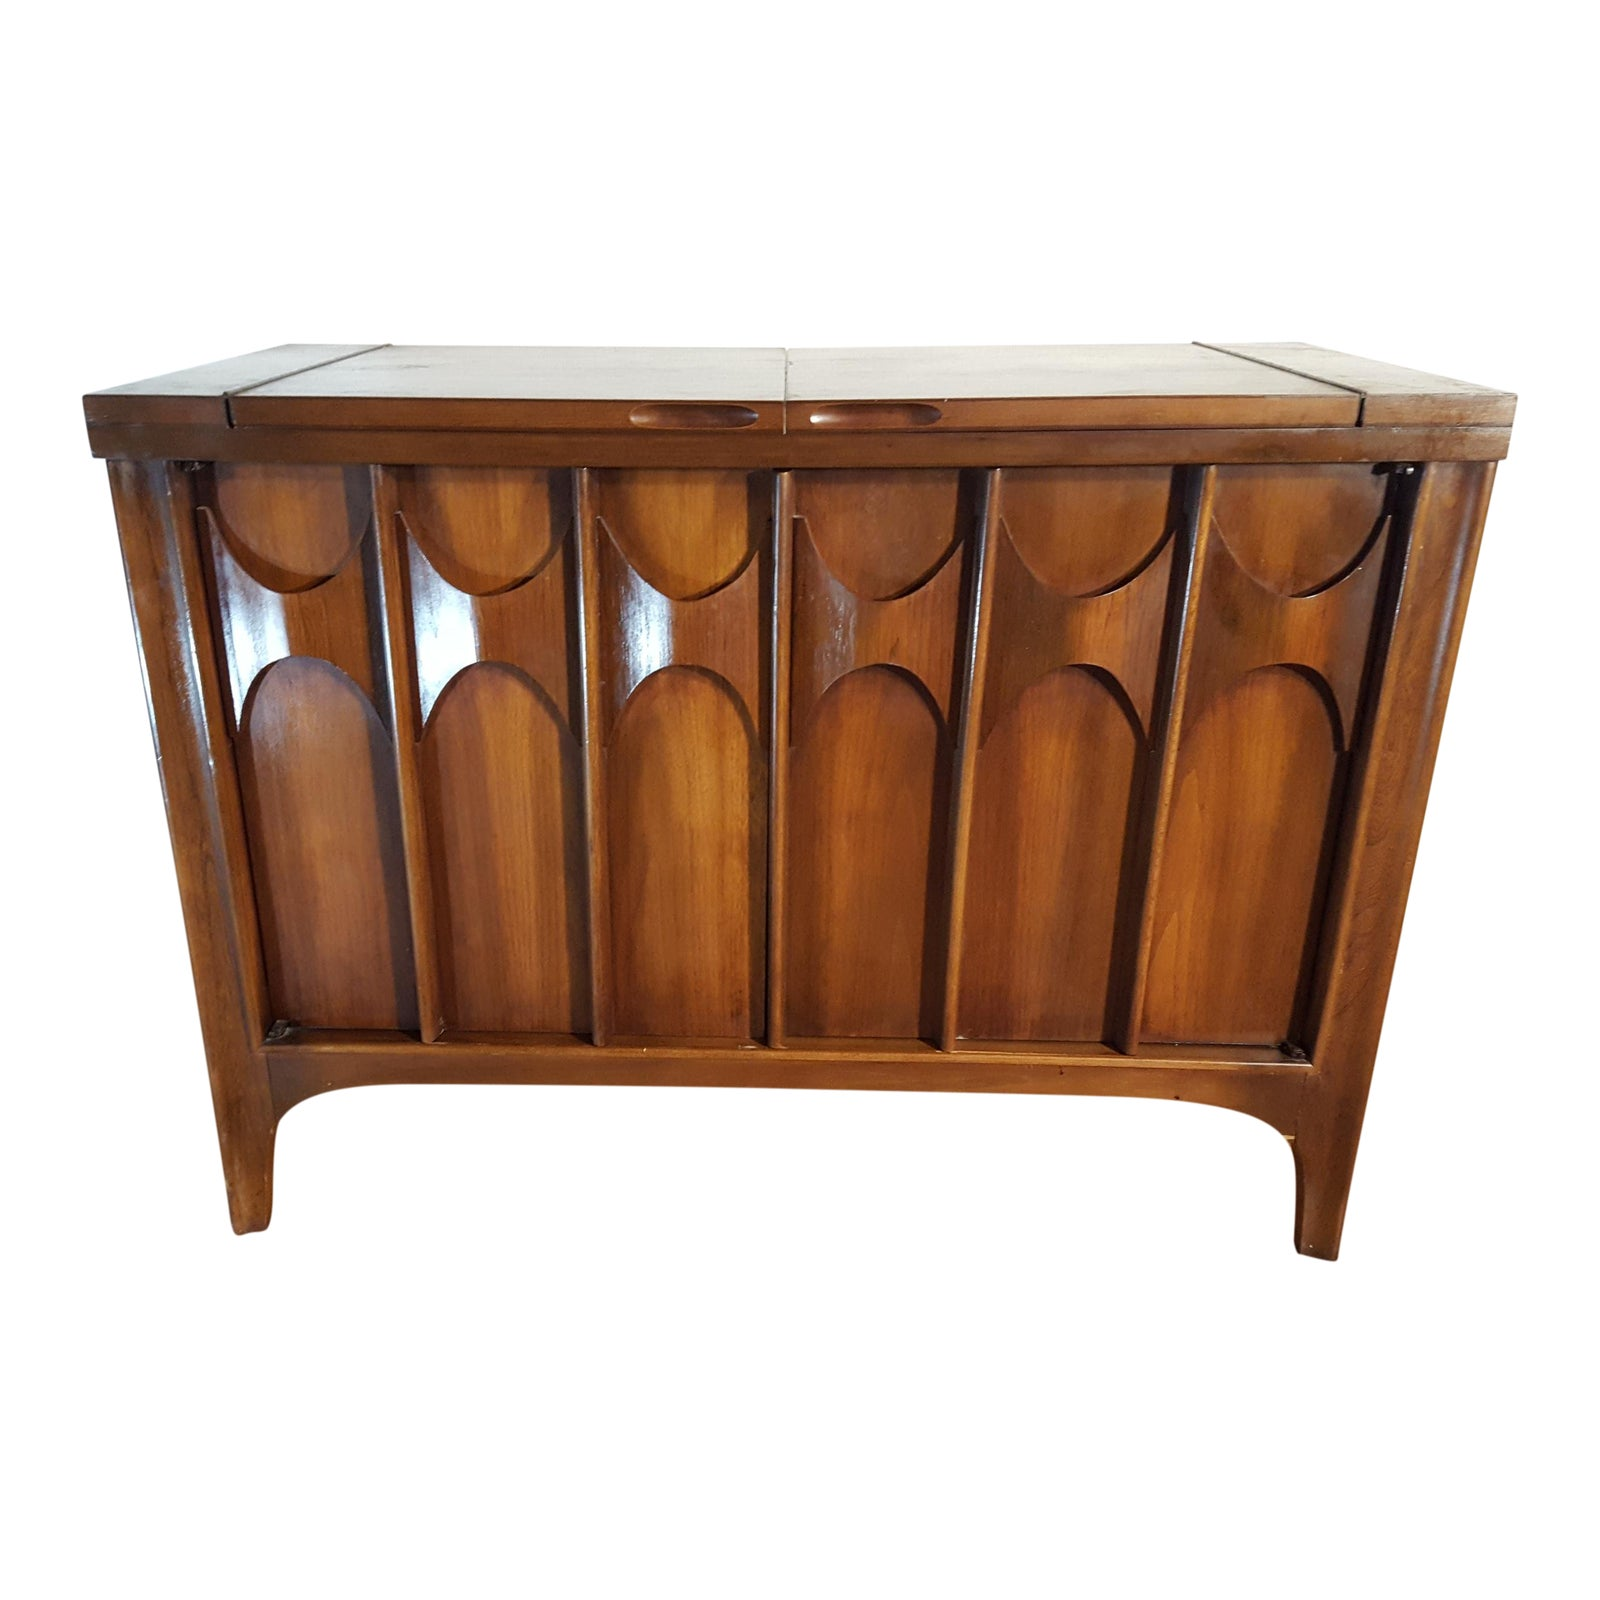 Mid century modern furniture kent coffey perspecta bar cart chairish